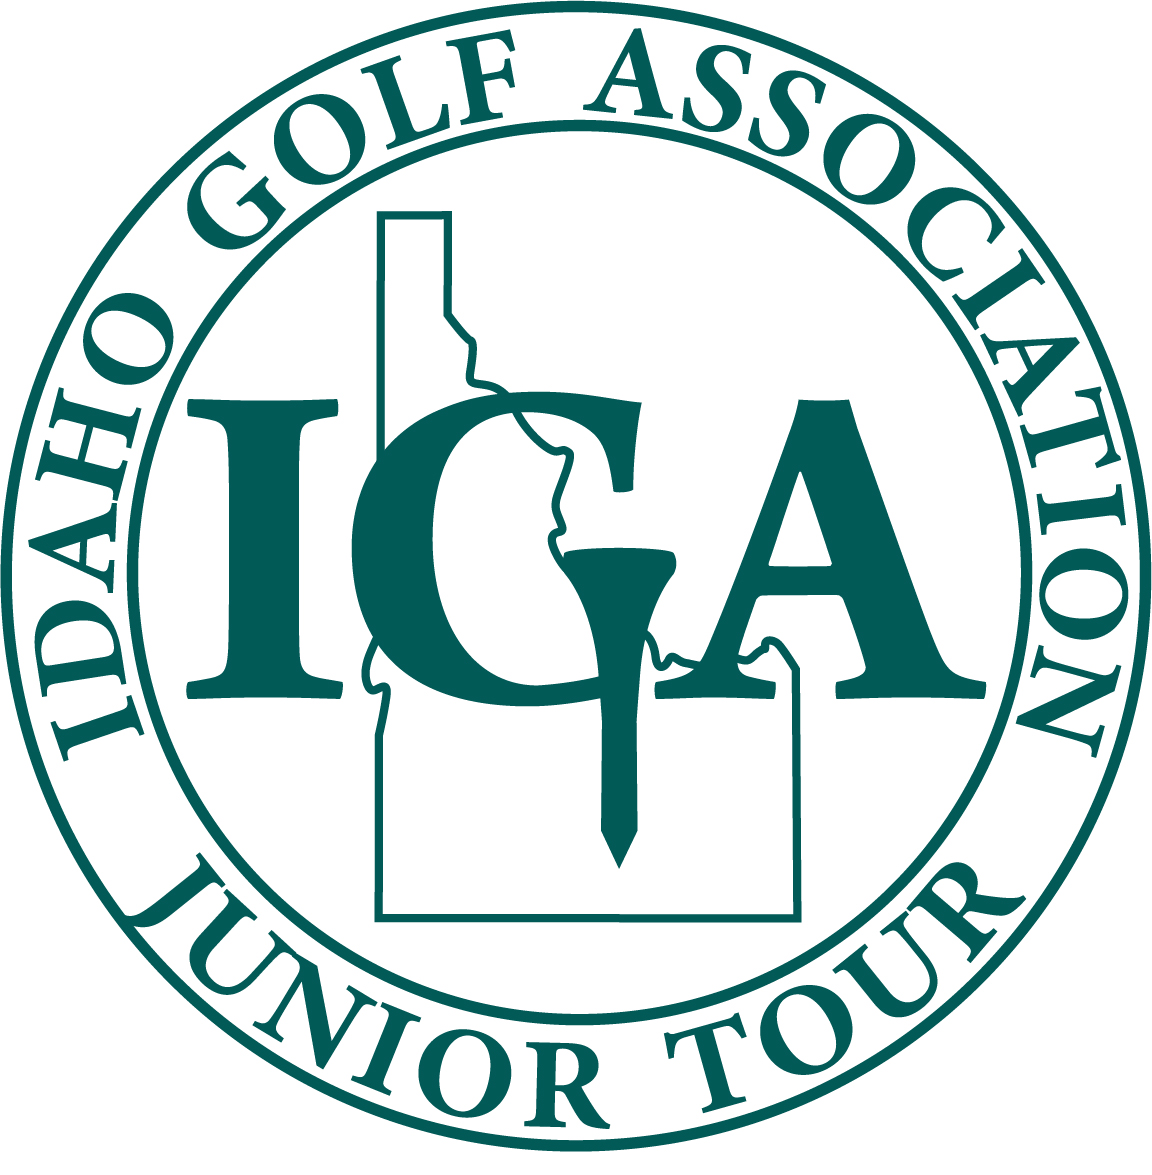 IGA NEW JUNIOR TOUR LOGO 2018 CIRCLE RBG JPG.jpg